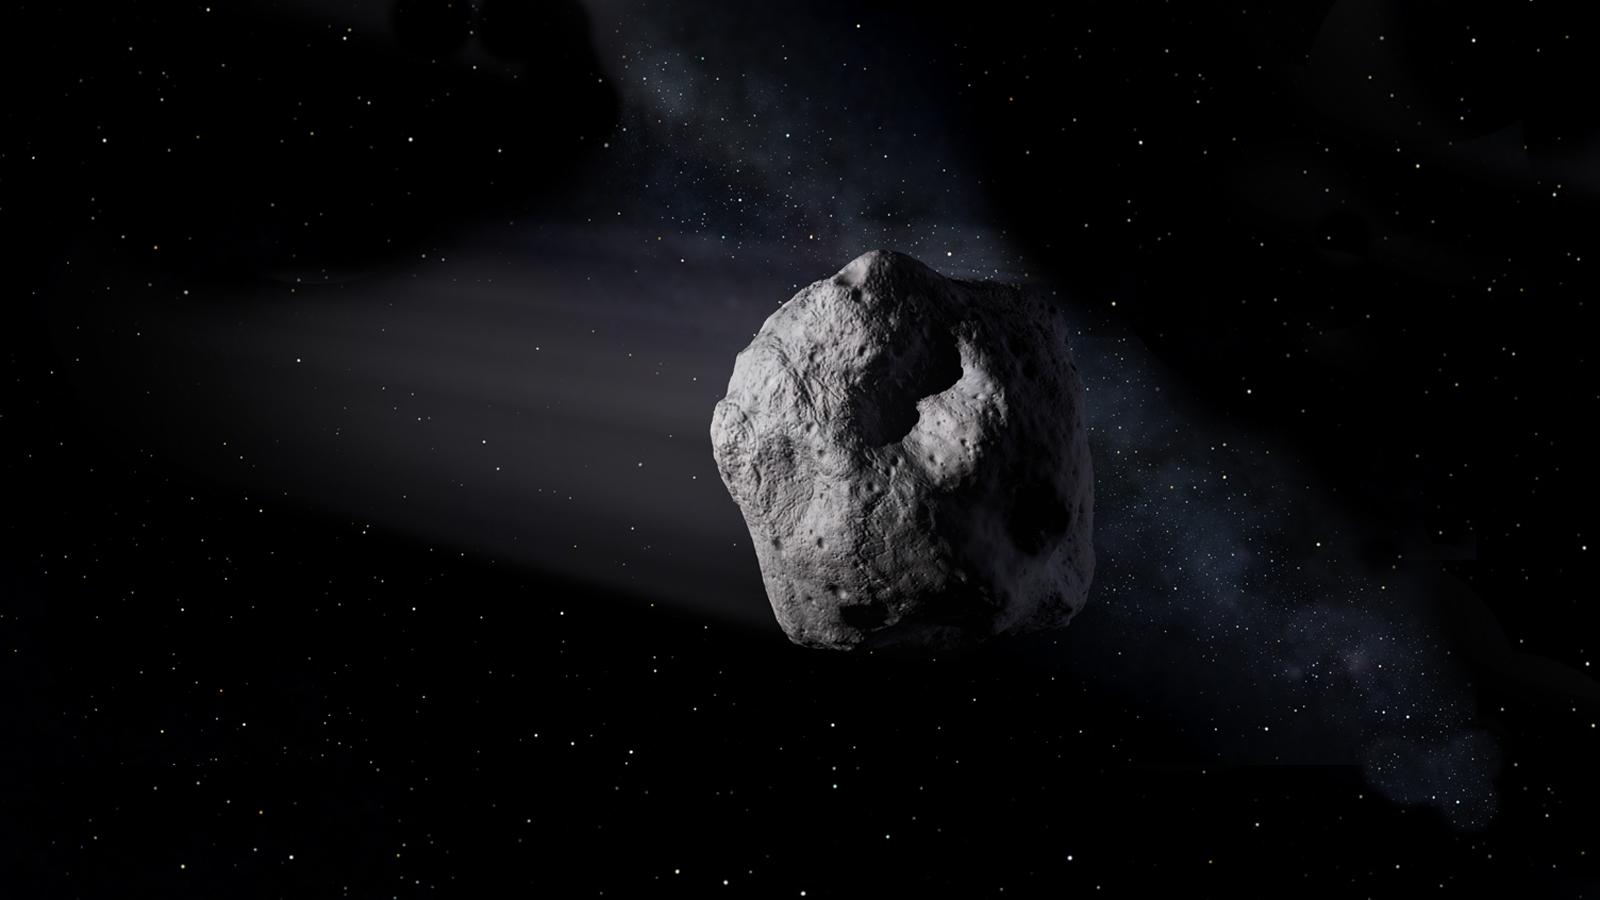 'Potentially hazardous': NASA warns of 2 asteroids heading this way in May